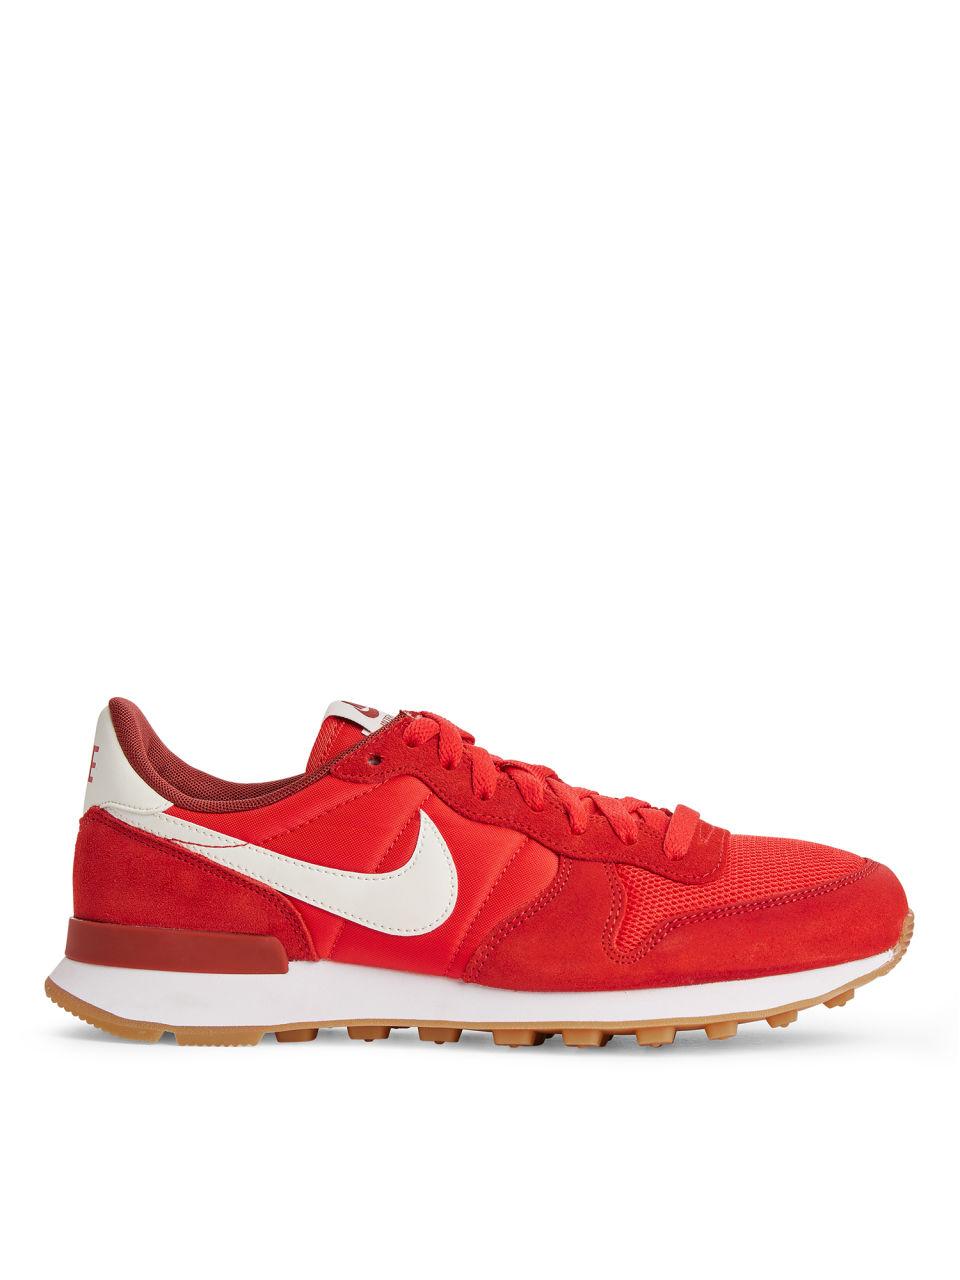 Nike Internationalist - Red - Shoes - ARKET   Nike ...